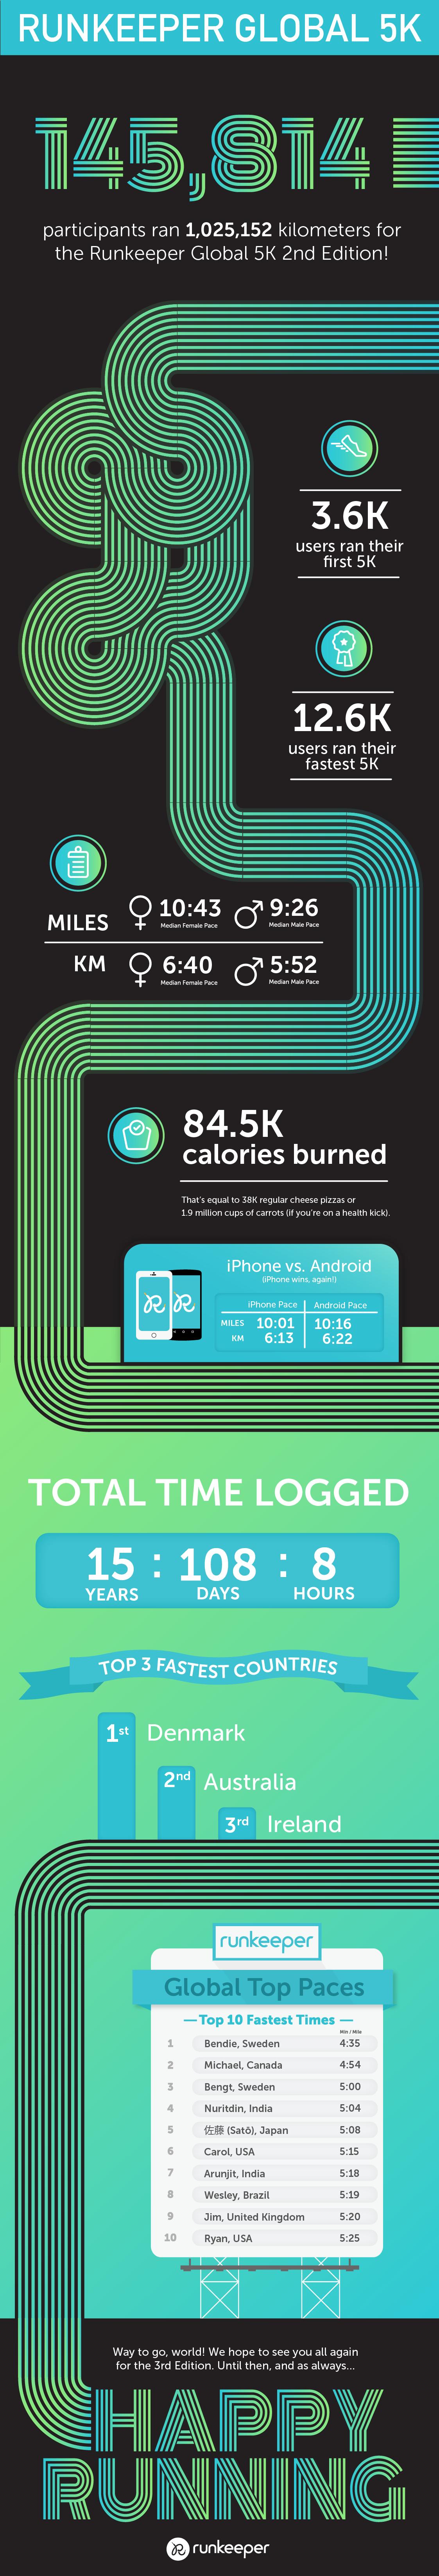 G5K_Infographic